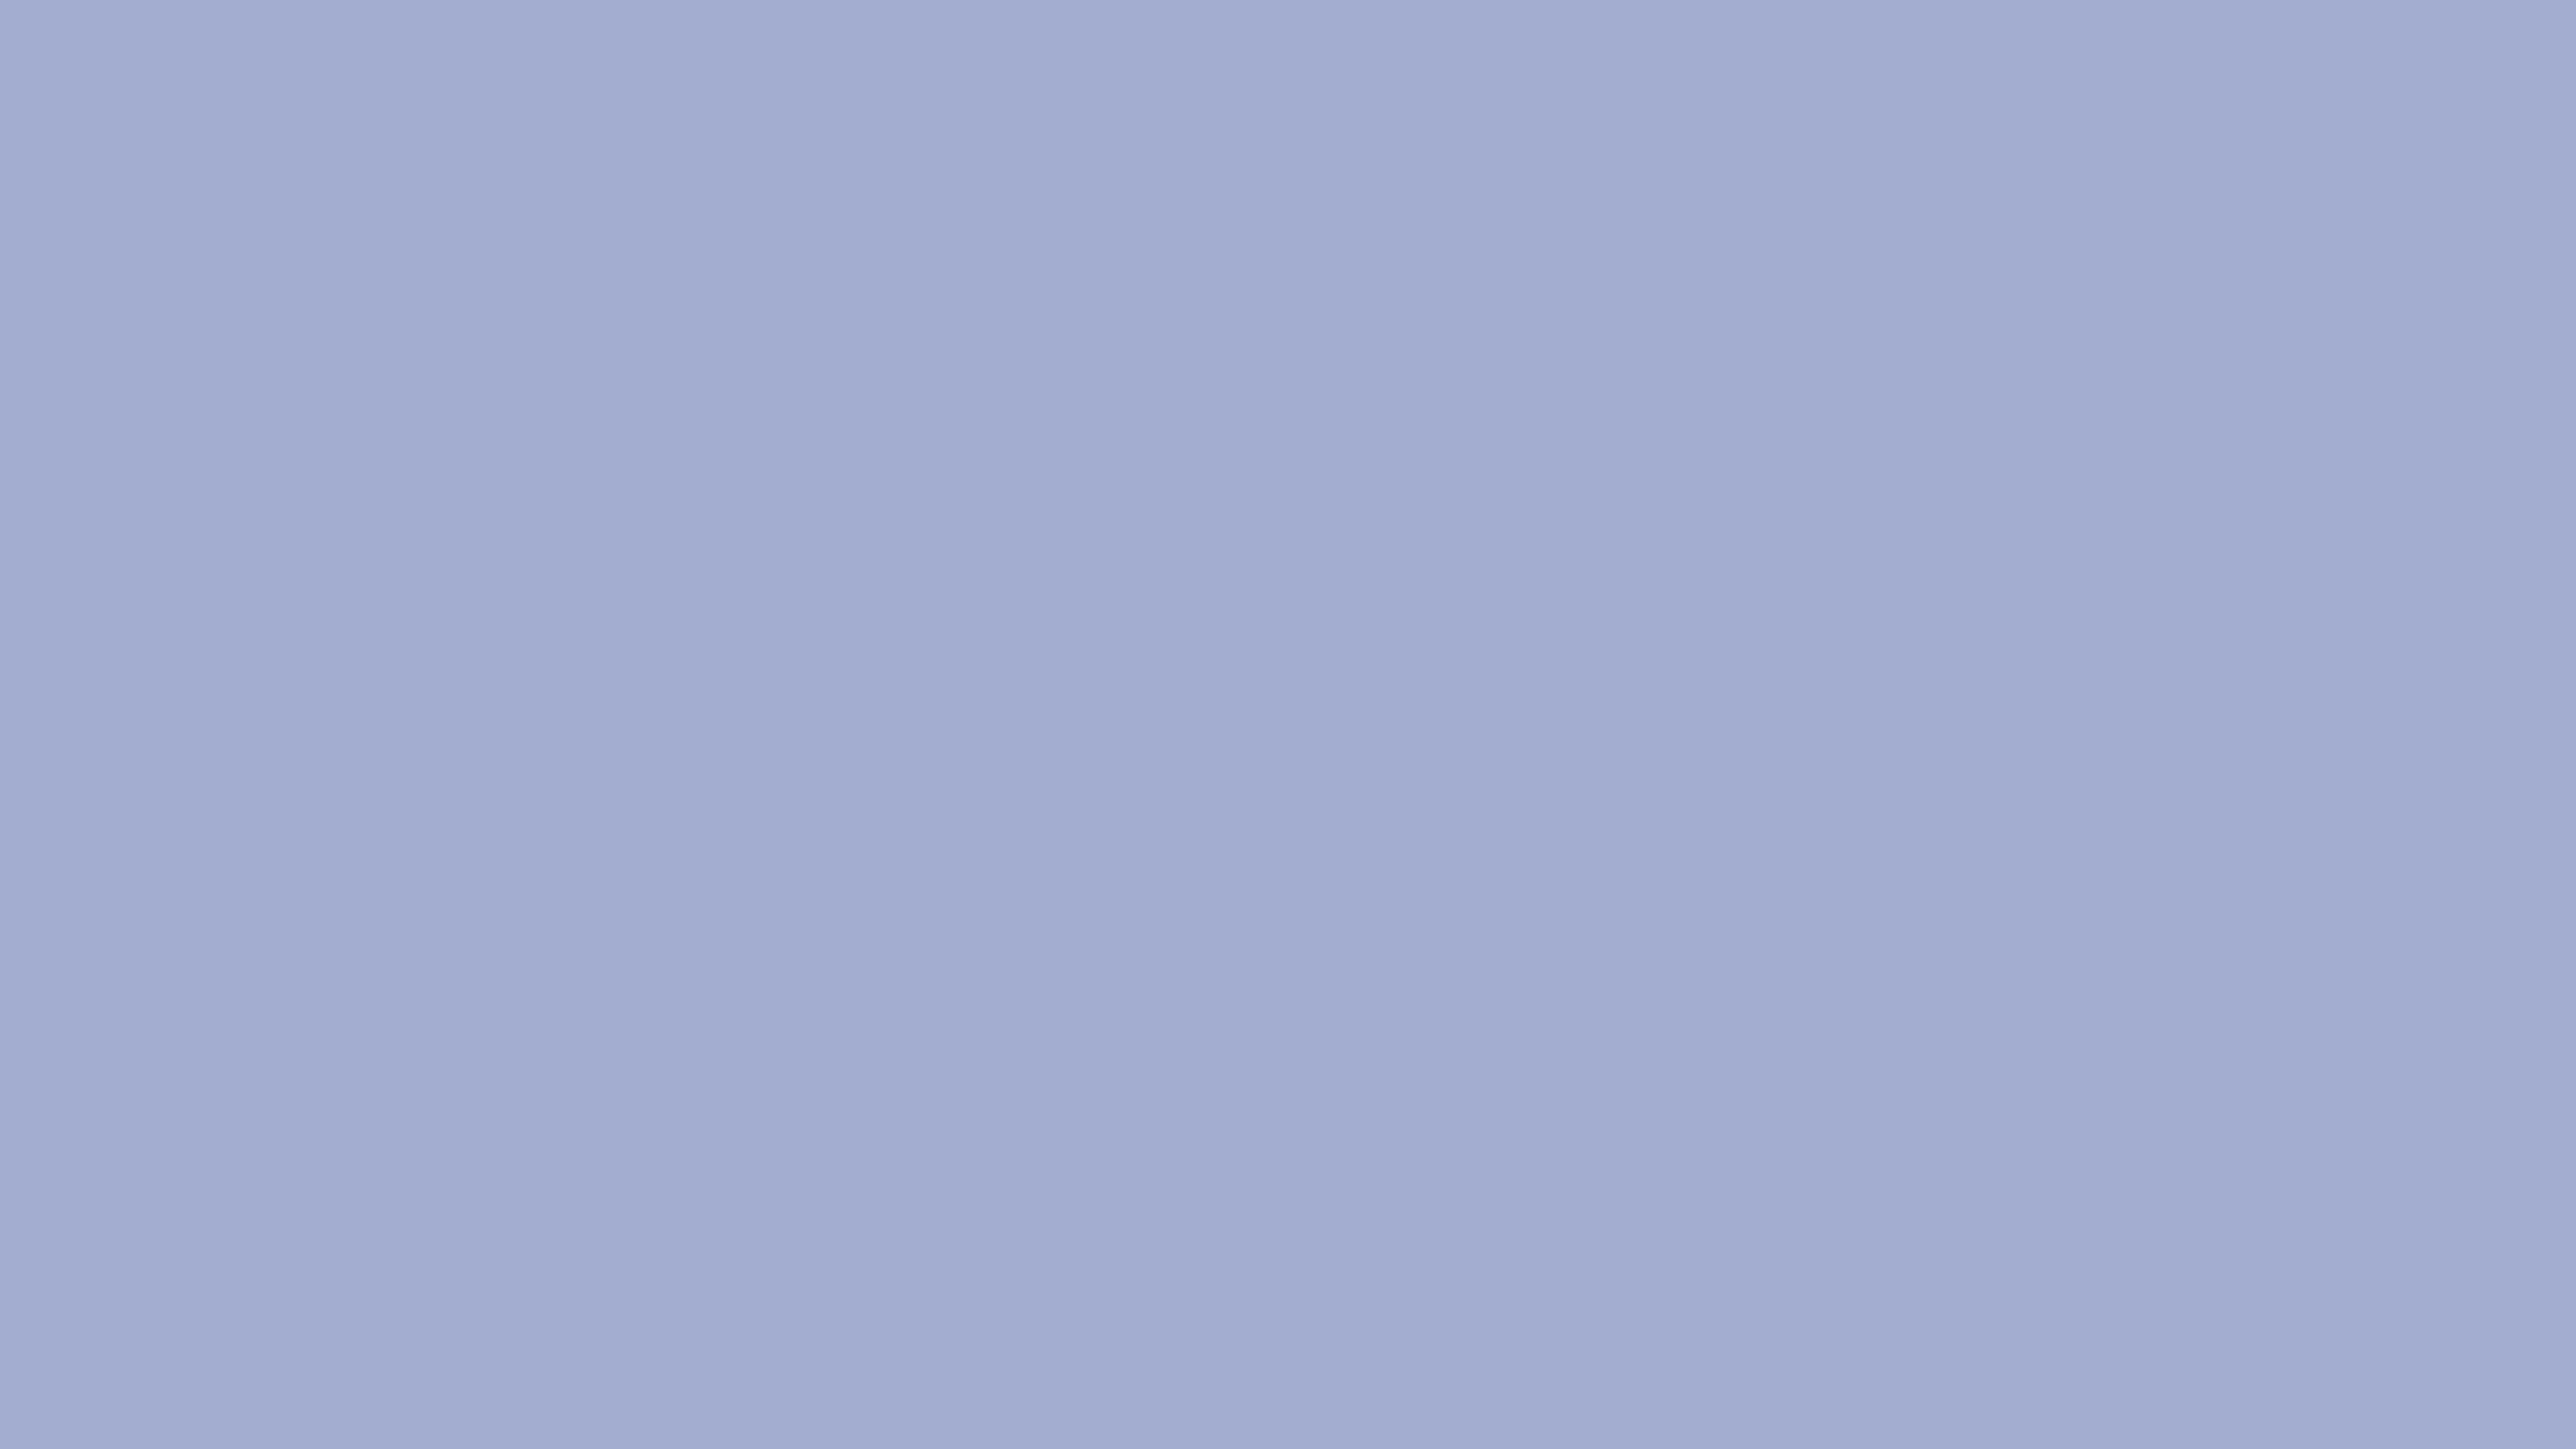 4096x2304 Wild Blue Yonder Solid Color Background